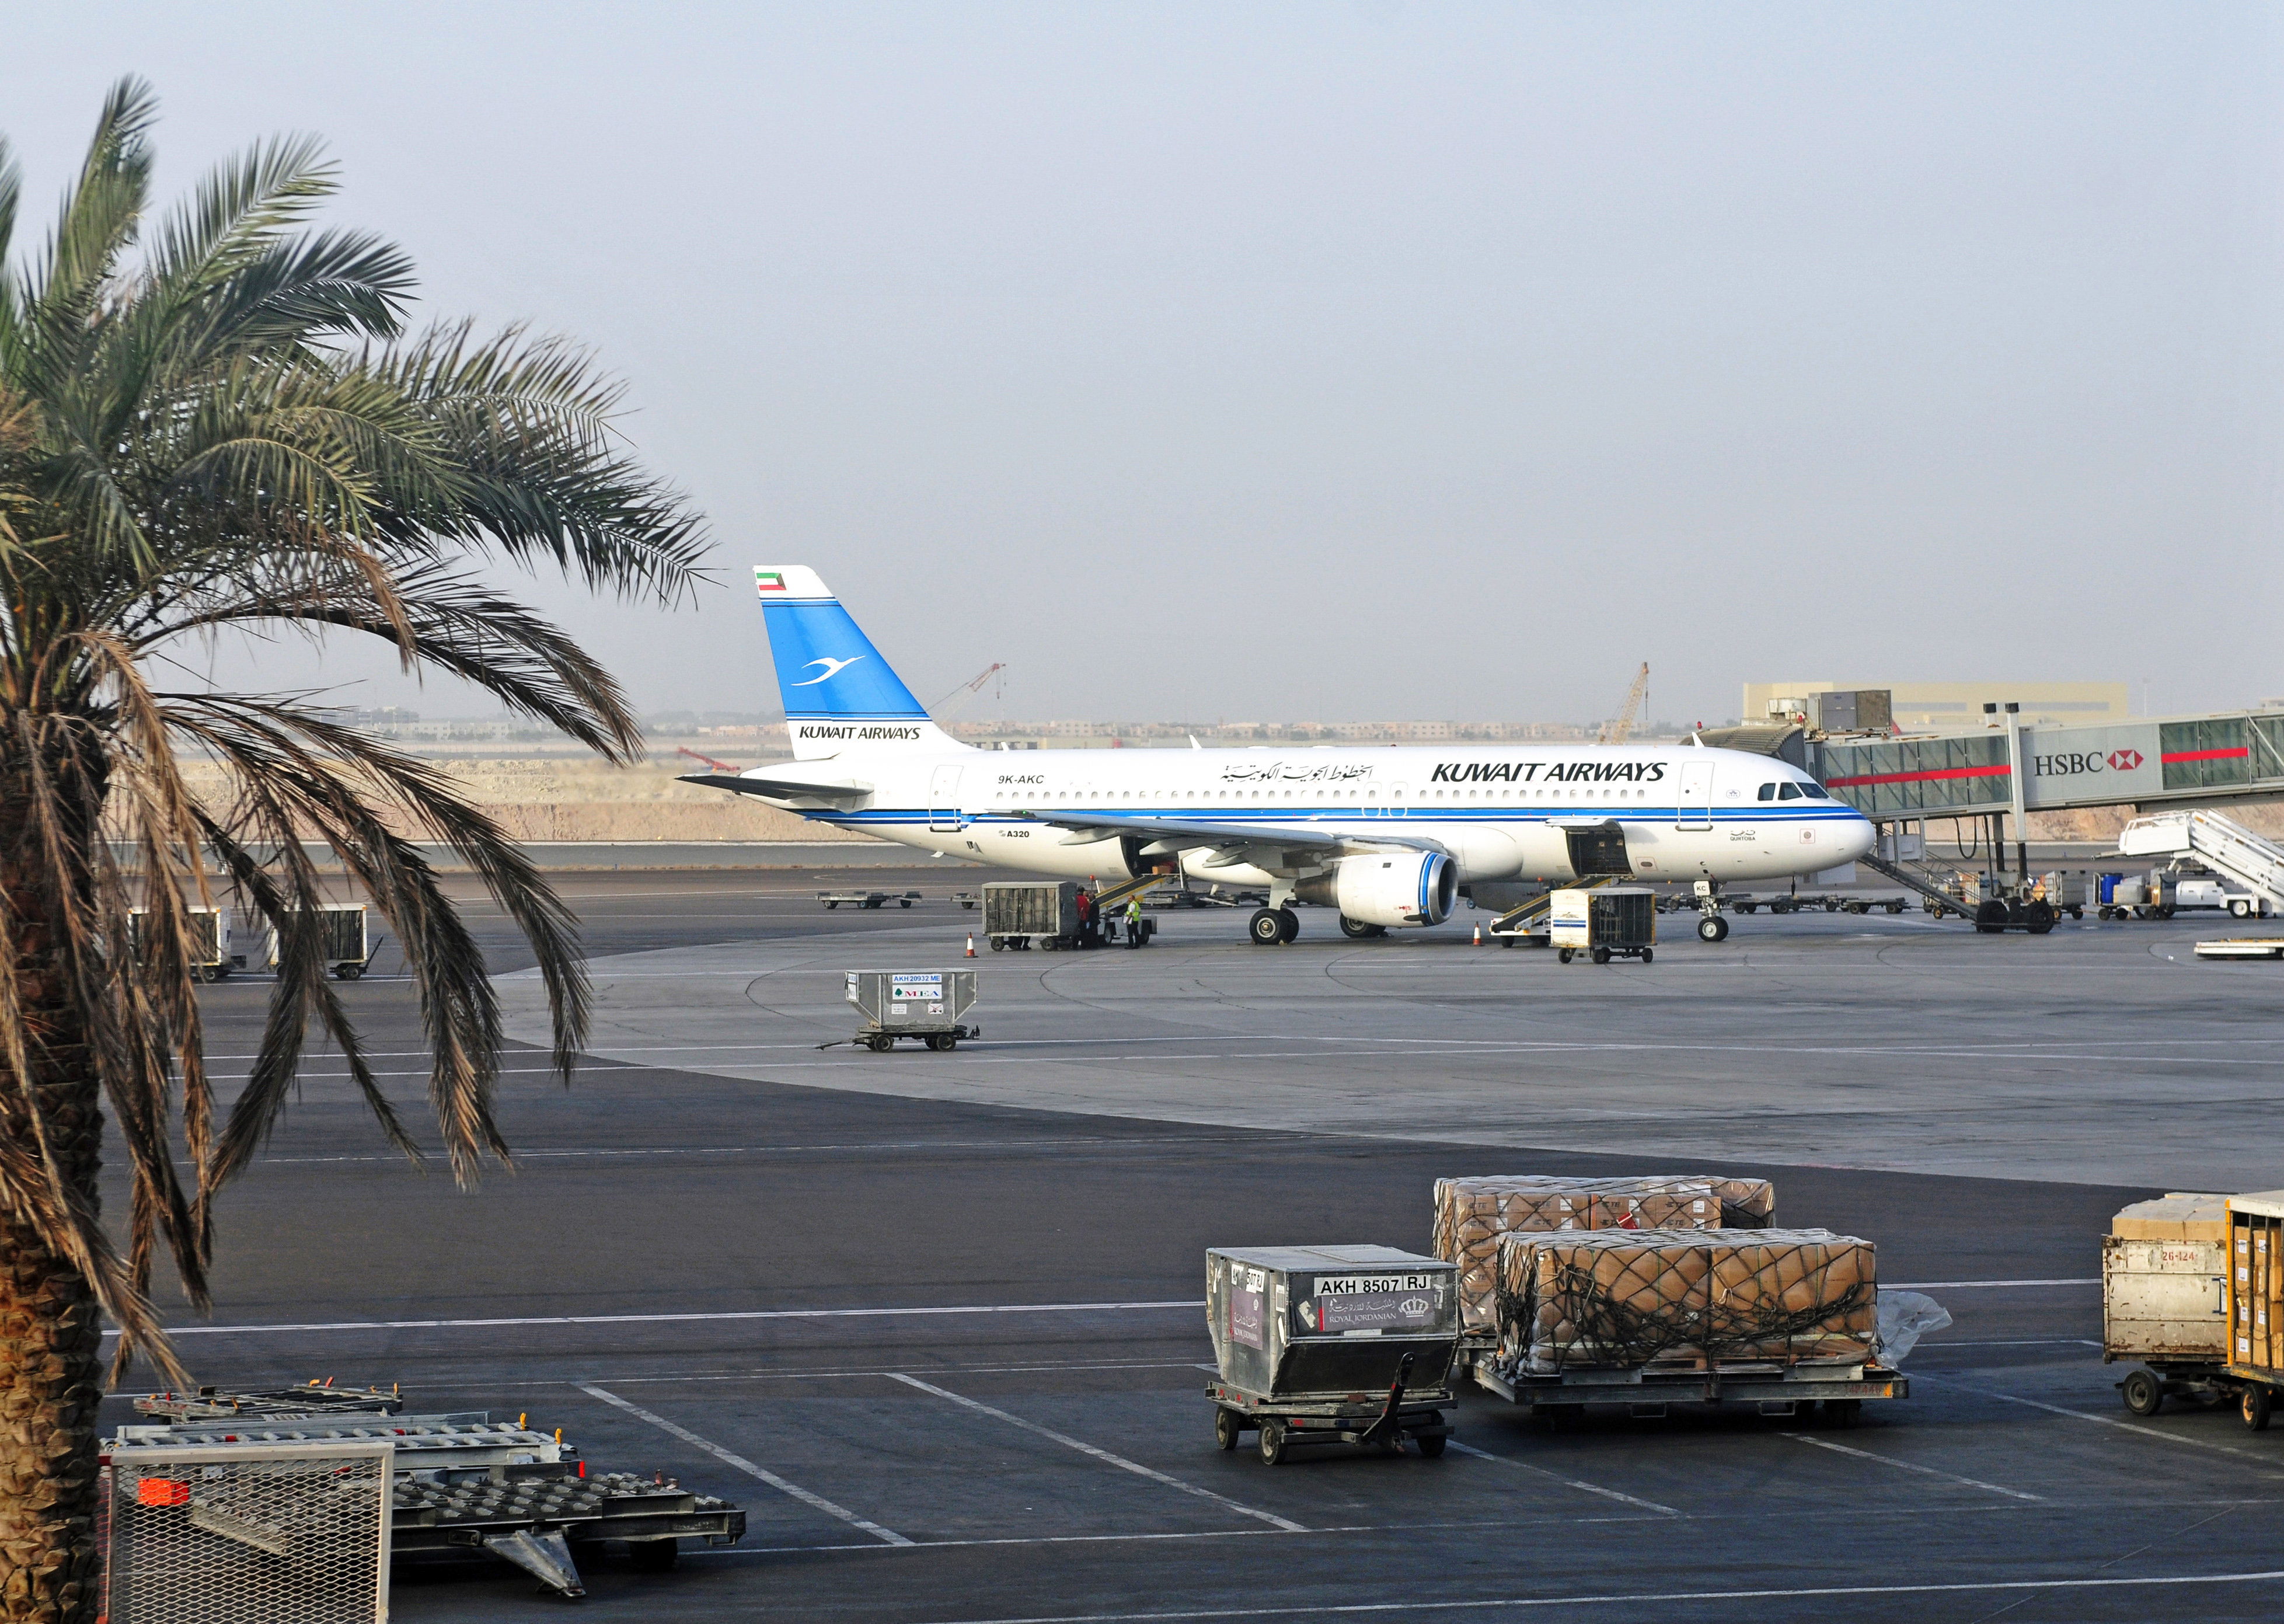 File:13-08-06-abu-dhabi-airport-28 jpg - Wikimedia Commons